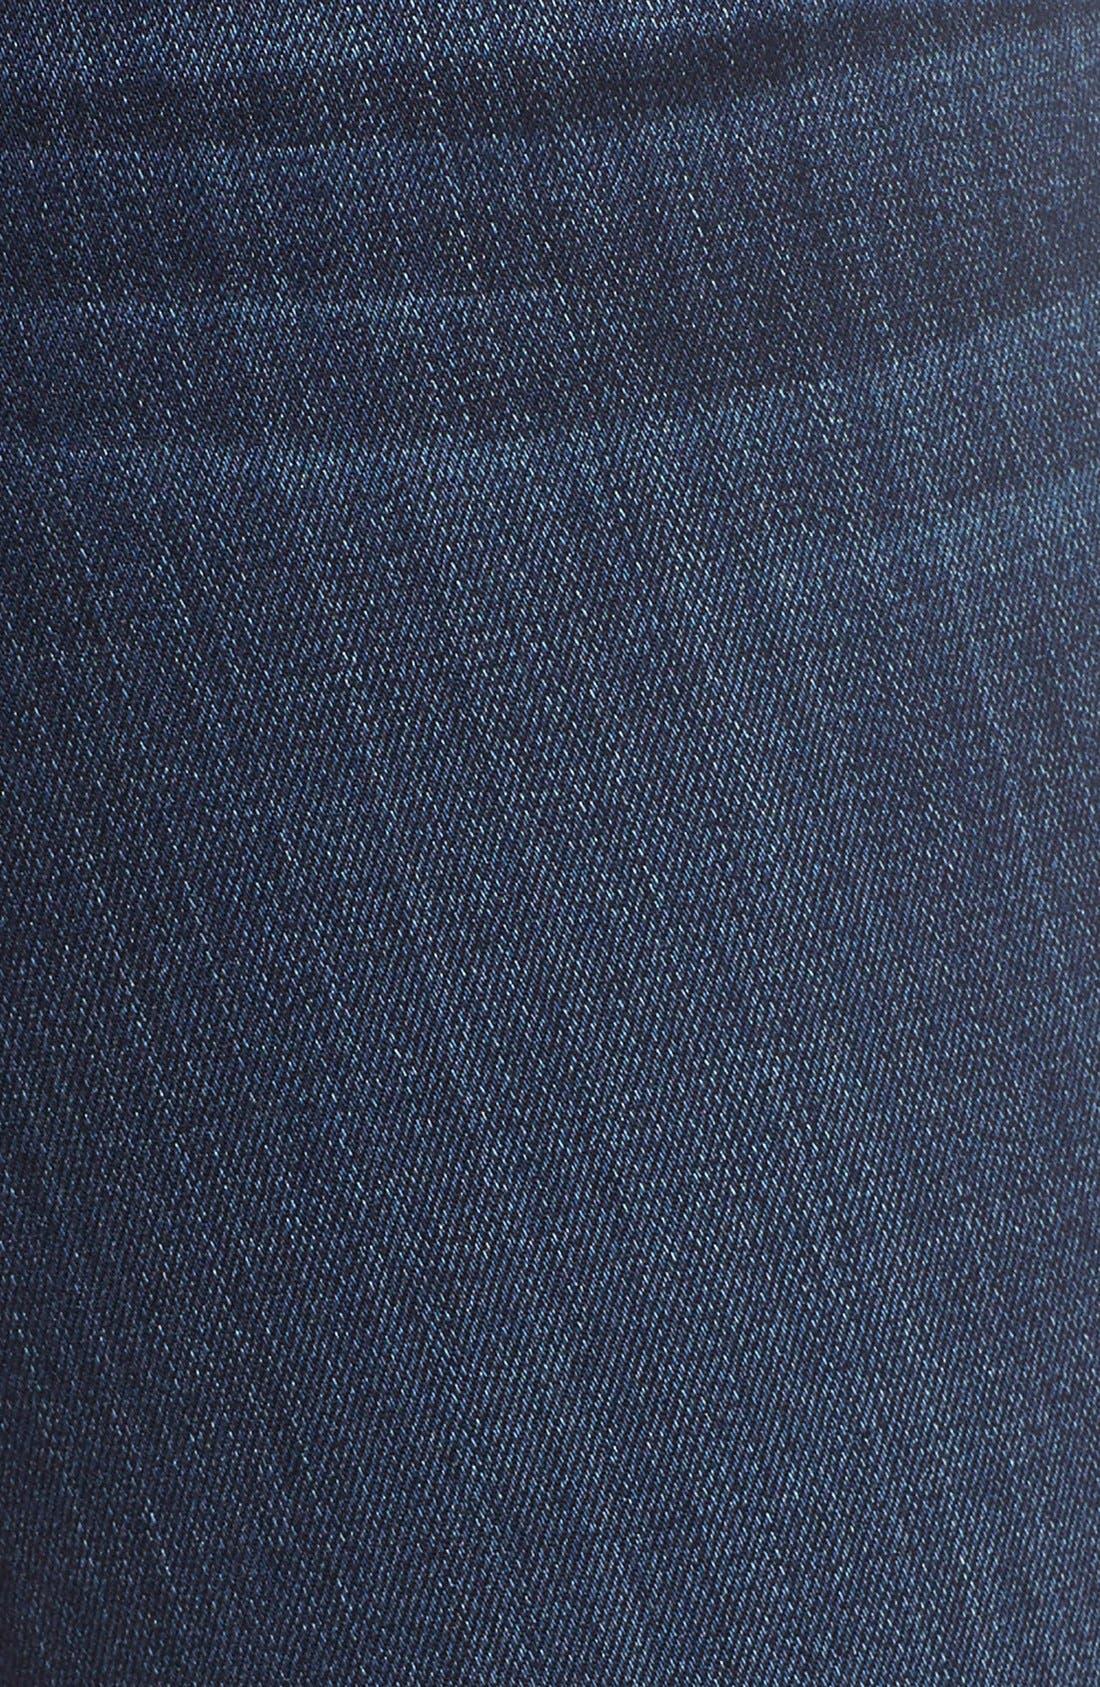 Alternate Image 5  - PAIGE Transcend - Hoxton High Waist Ankle Ultra Skinny Jeans (Hartmann)